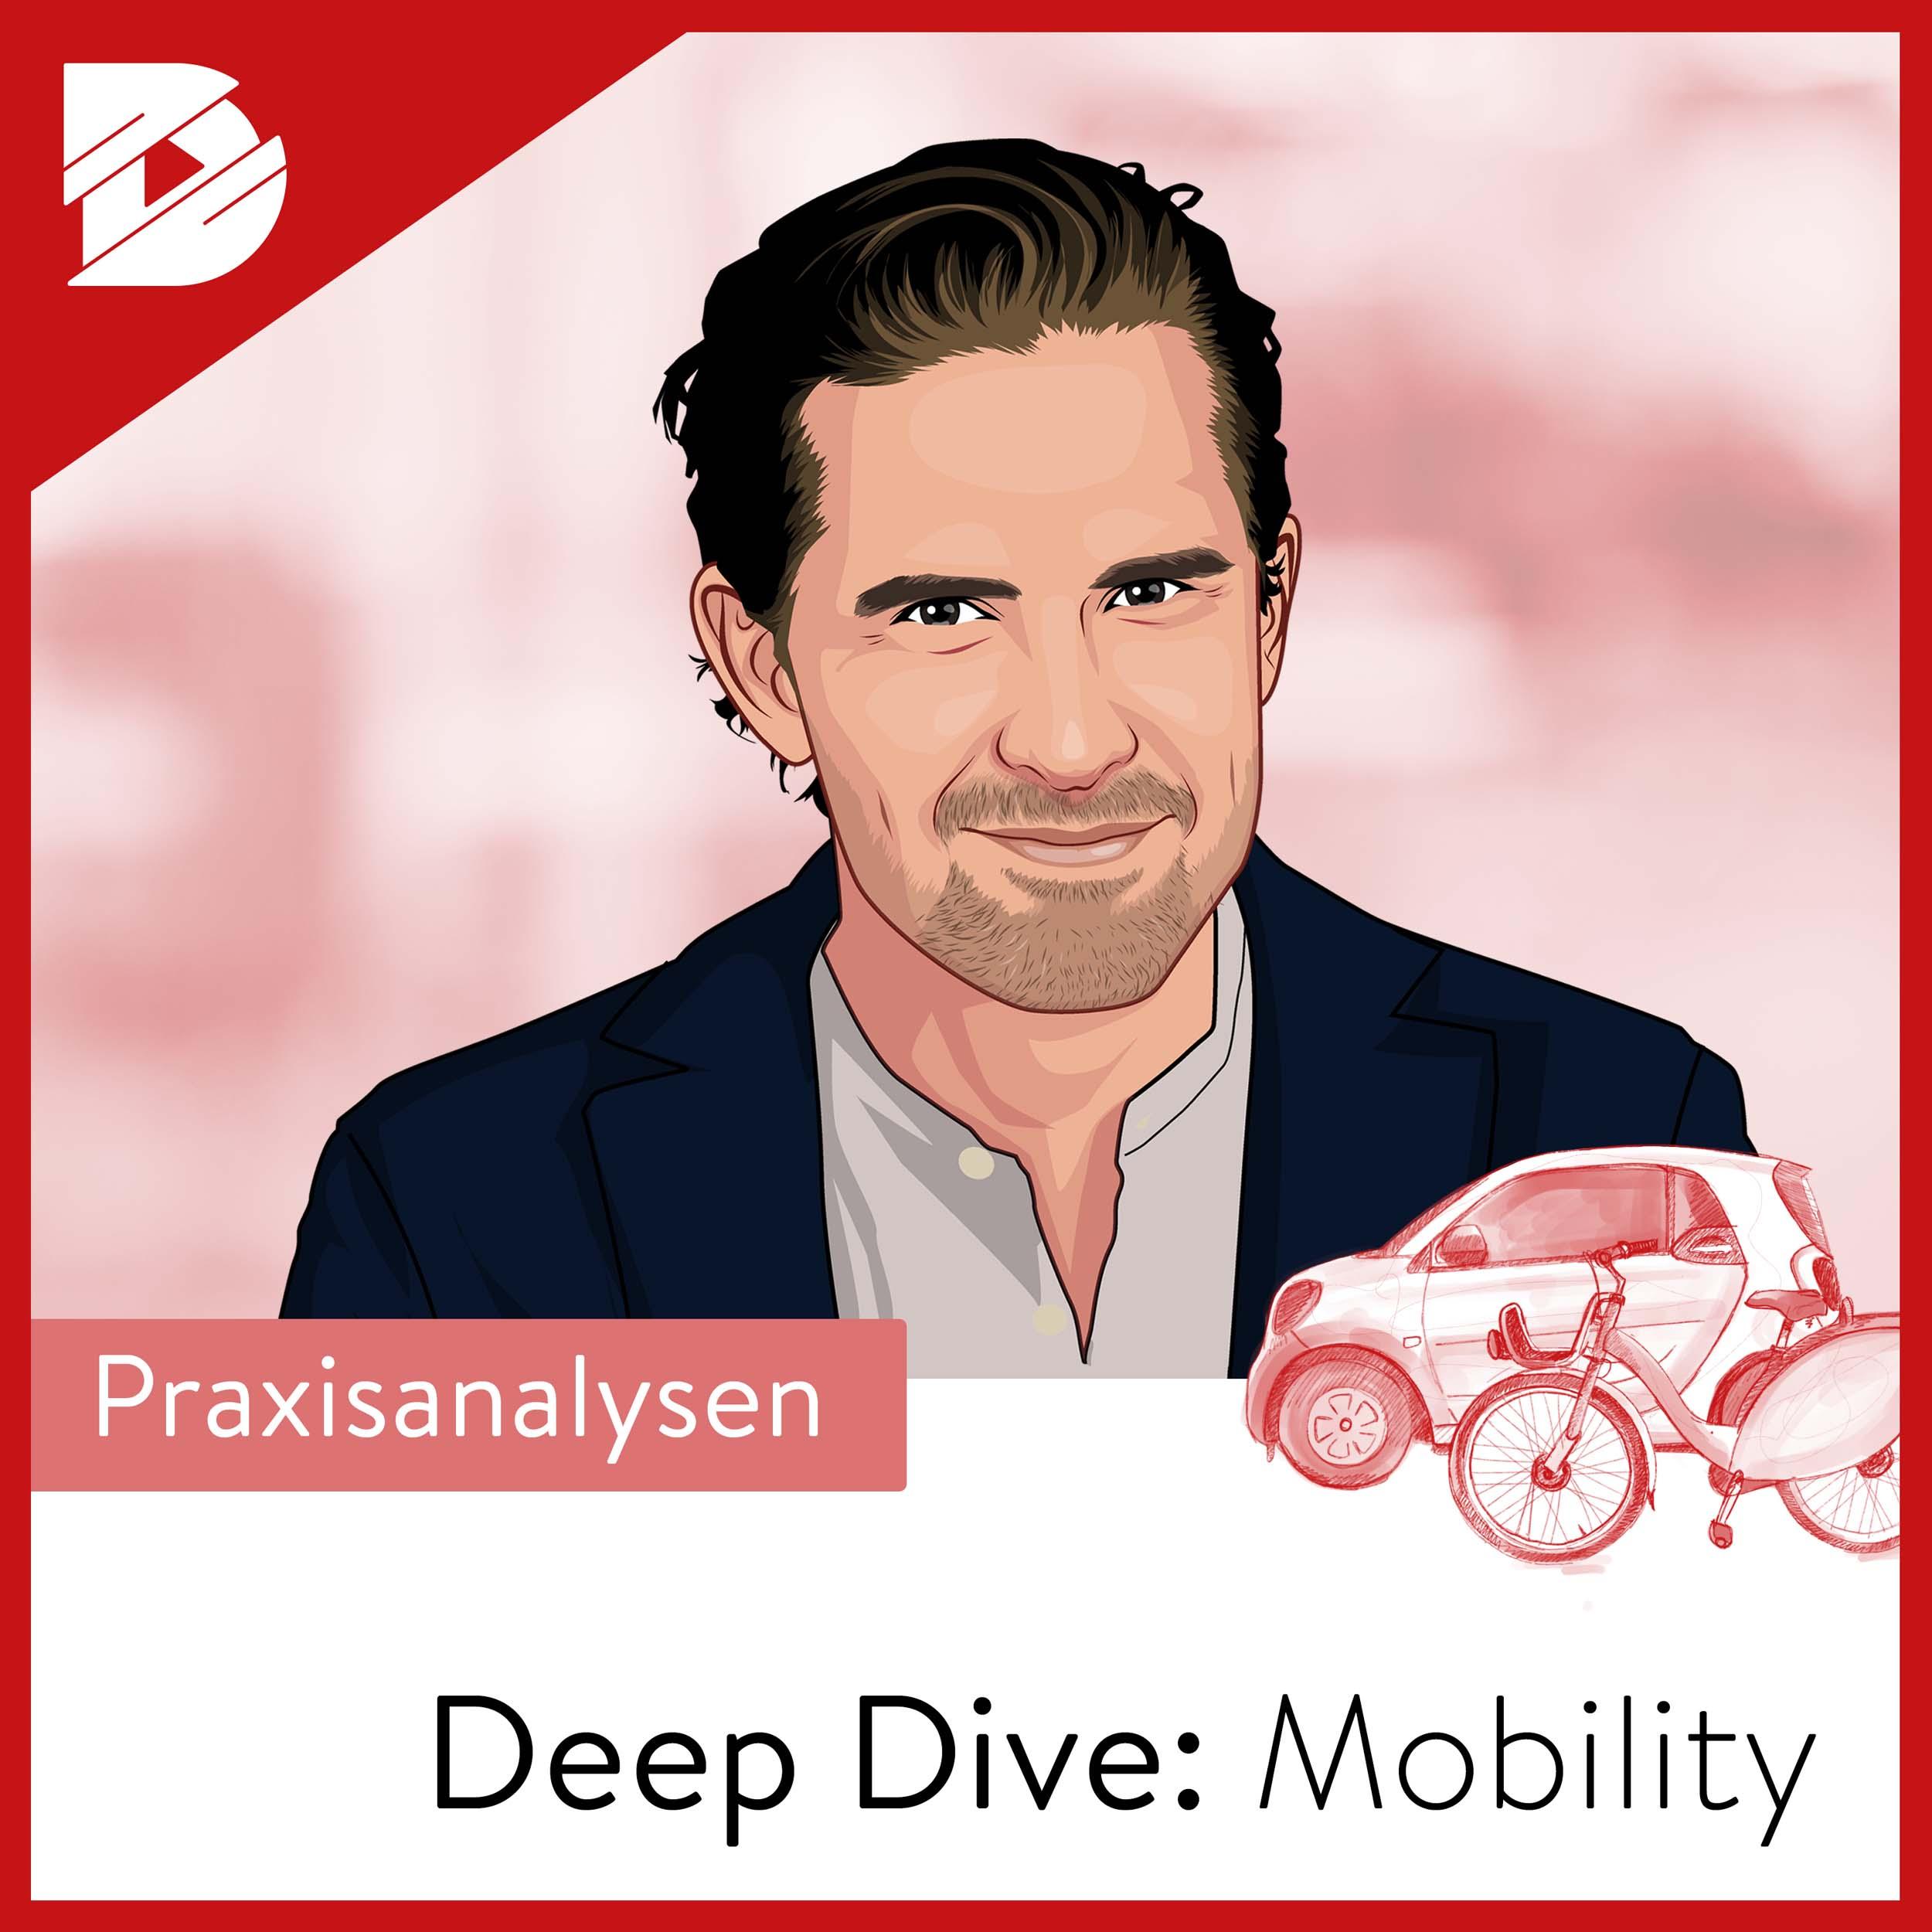 Deep Dive Mobility